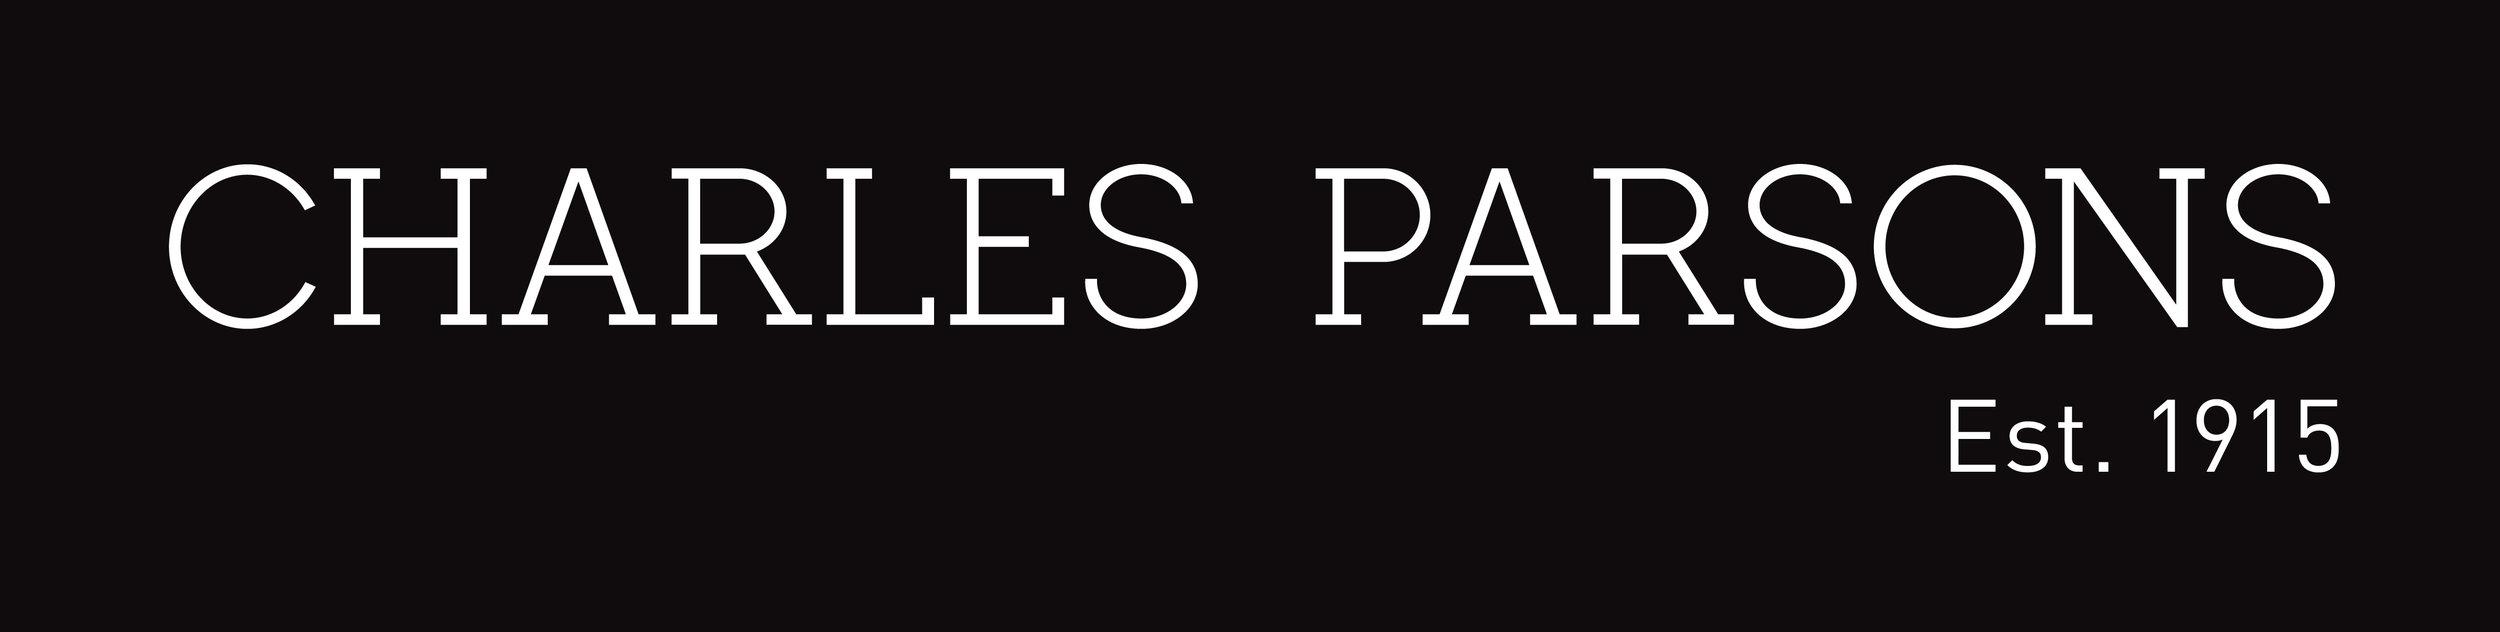 CP-Corporate-logo_White-on-Black.jpg